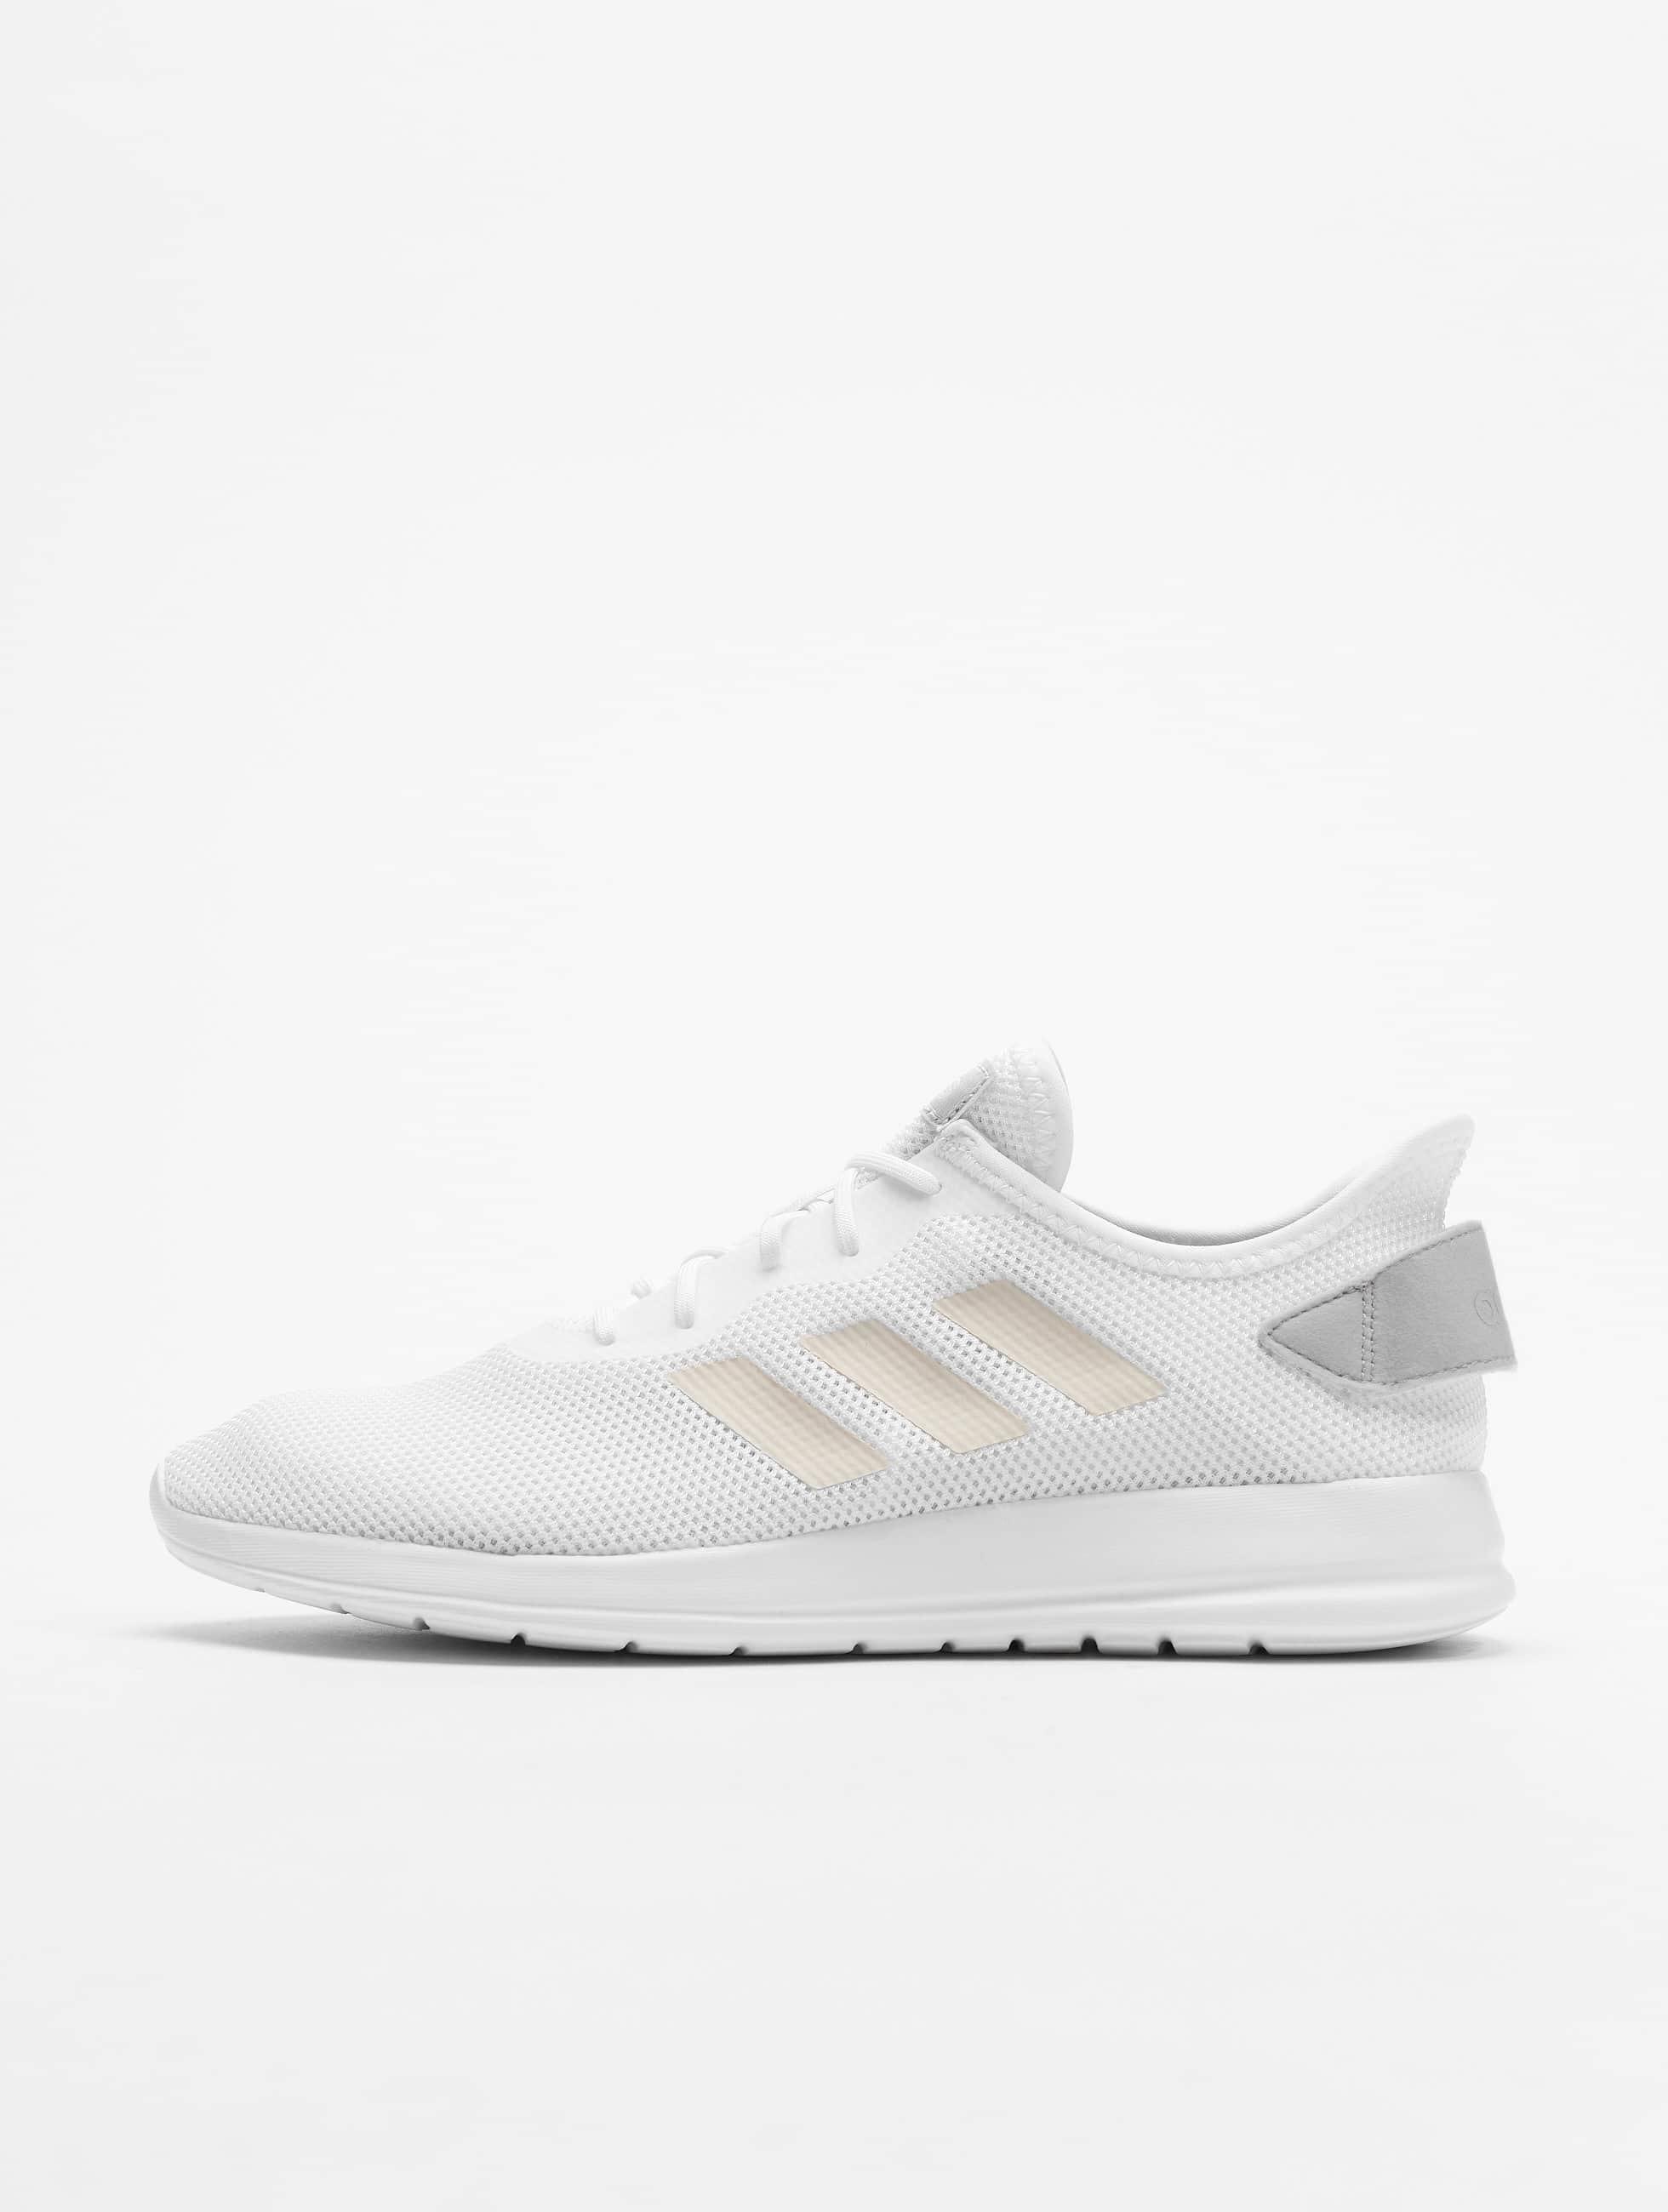 adidas Yatra Sneakers WhiteGrey OneCore Black